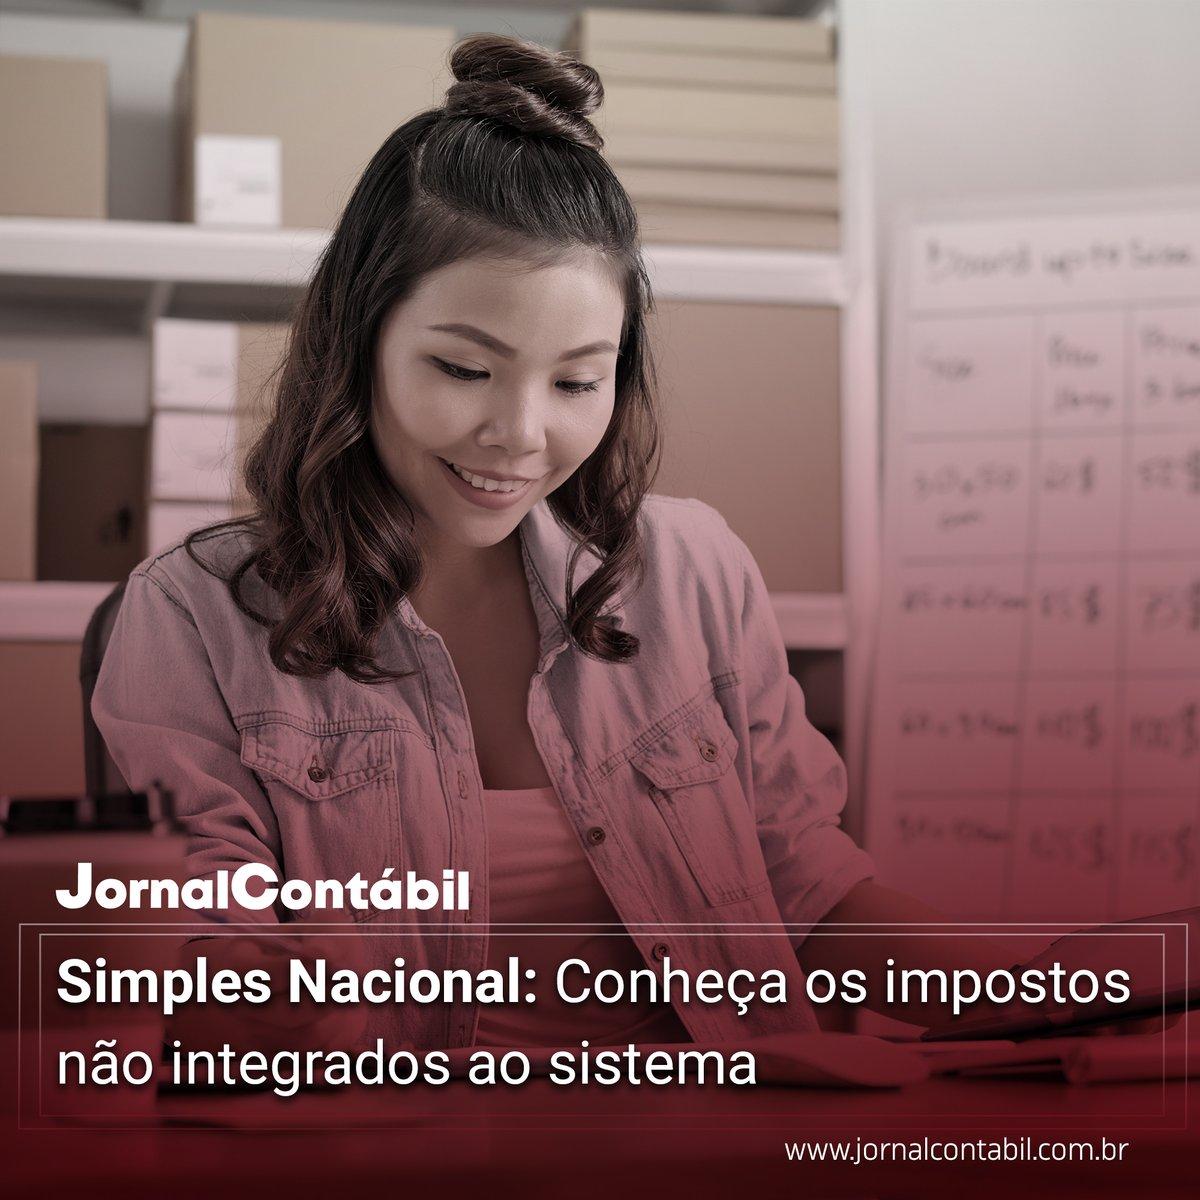 Leia a matéria completa no site Jornal Contábil:  https://t.co/XPA5LrR2Wr  #simplesnacional #tributos #mei #empreendedor #microempresas #pequenaempresa #tributofederal #brasil #jornalcontabil #tributario https://t.co/jtJoIJXsY2